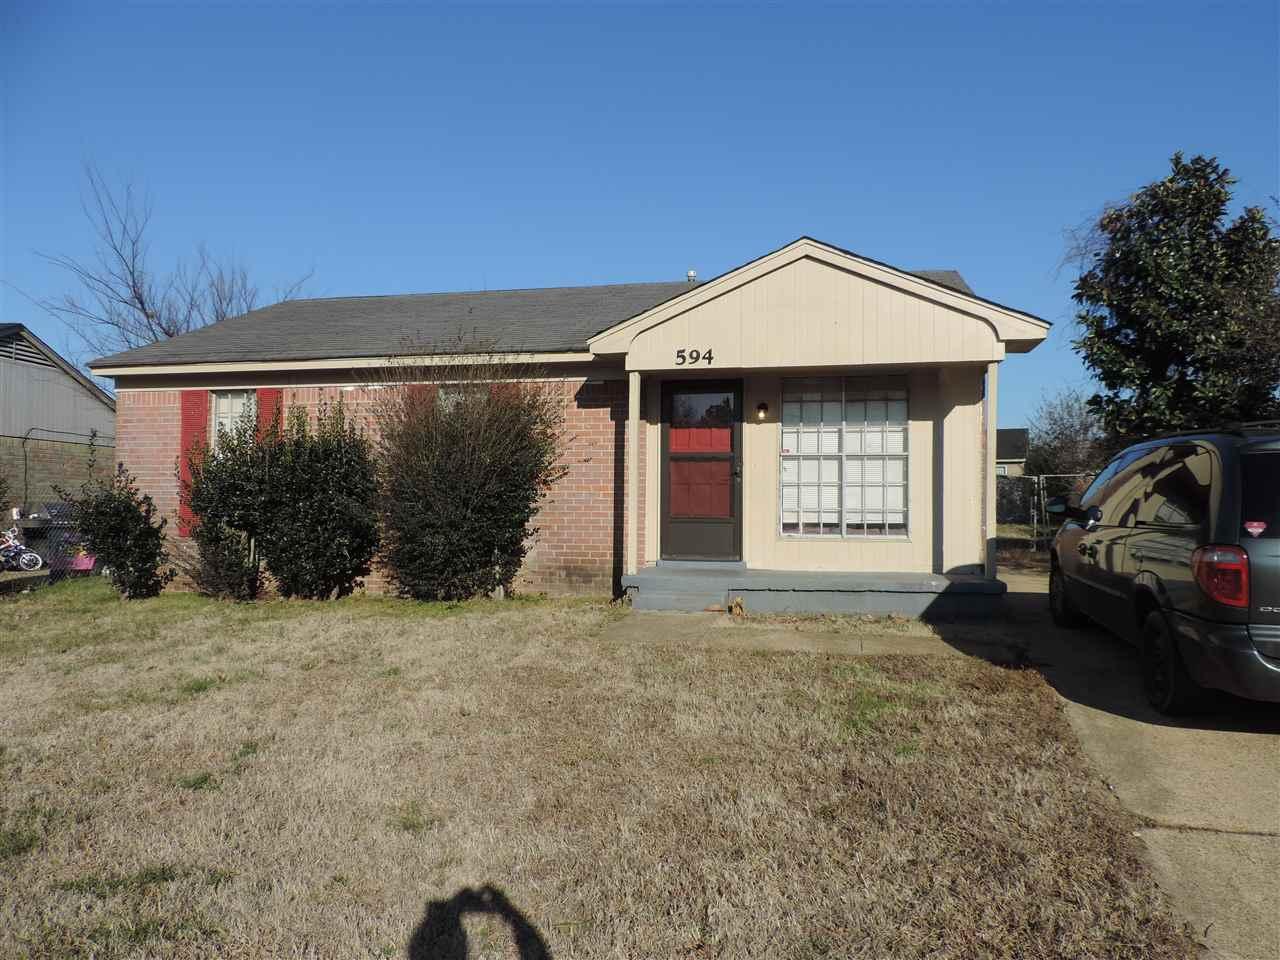 594 Blackhawk Rd, Memphis, TN